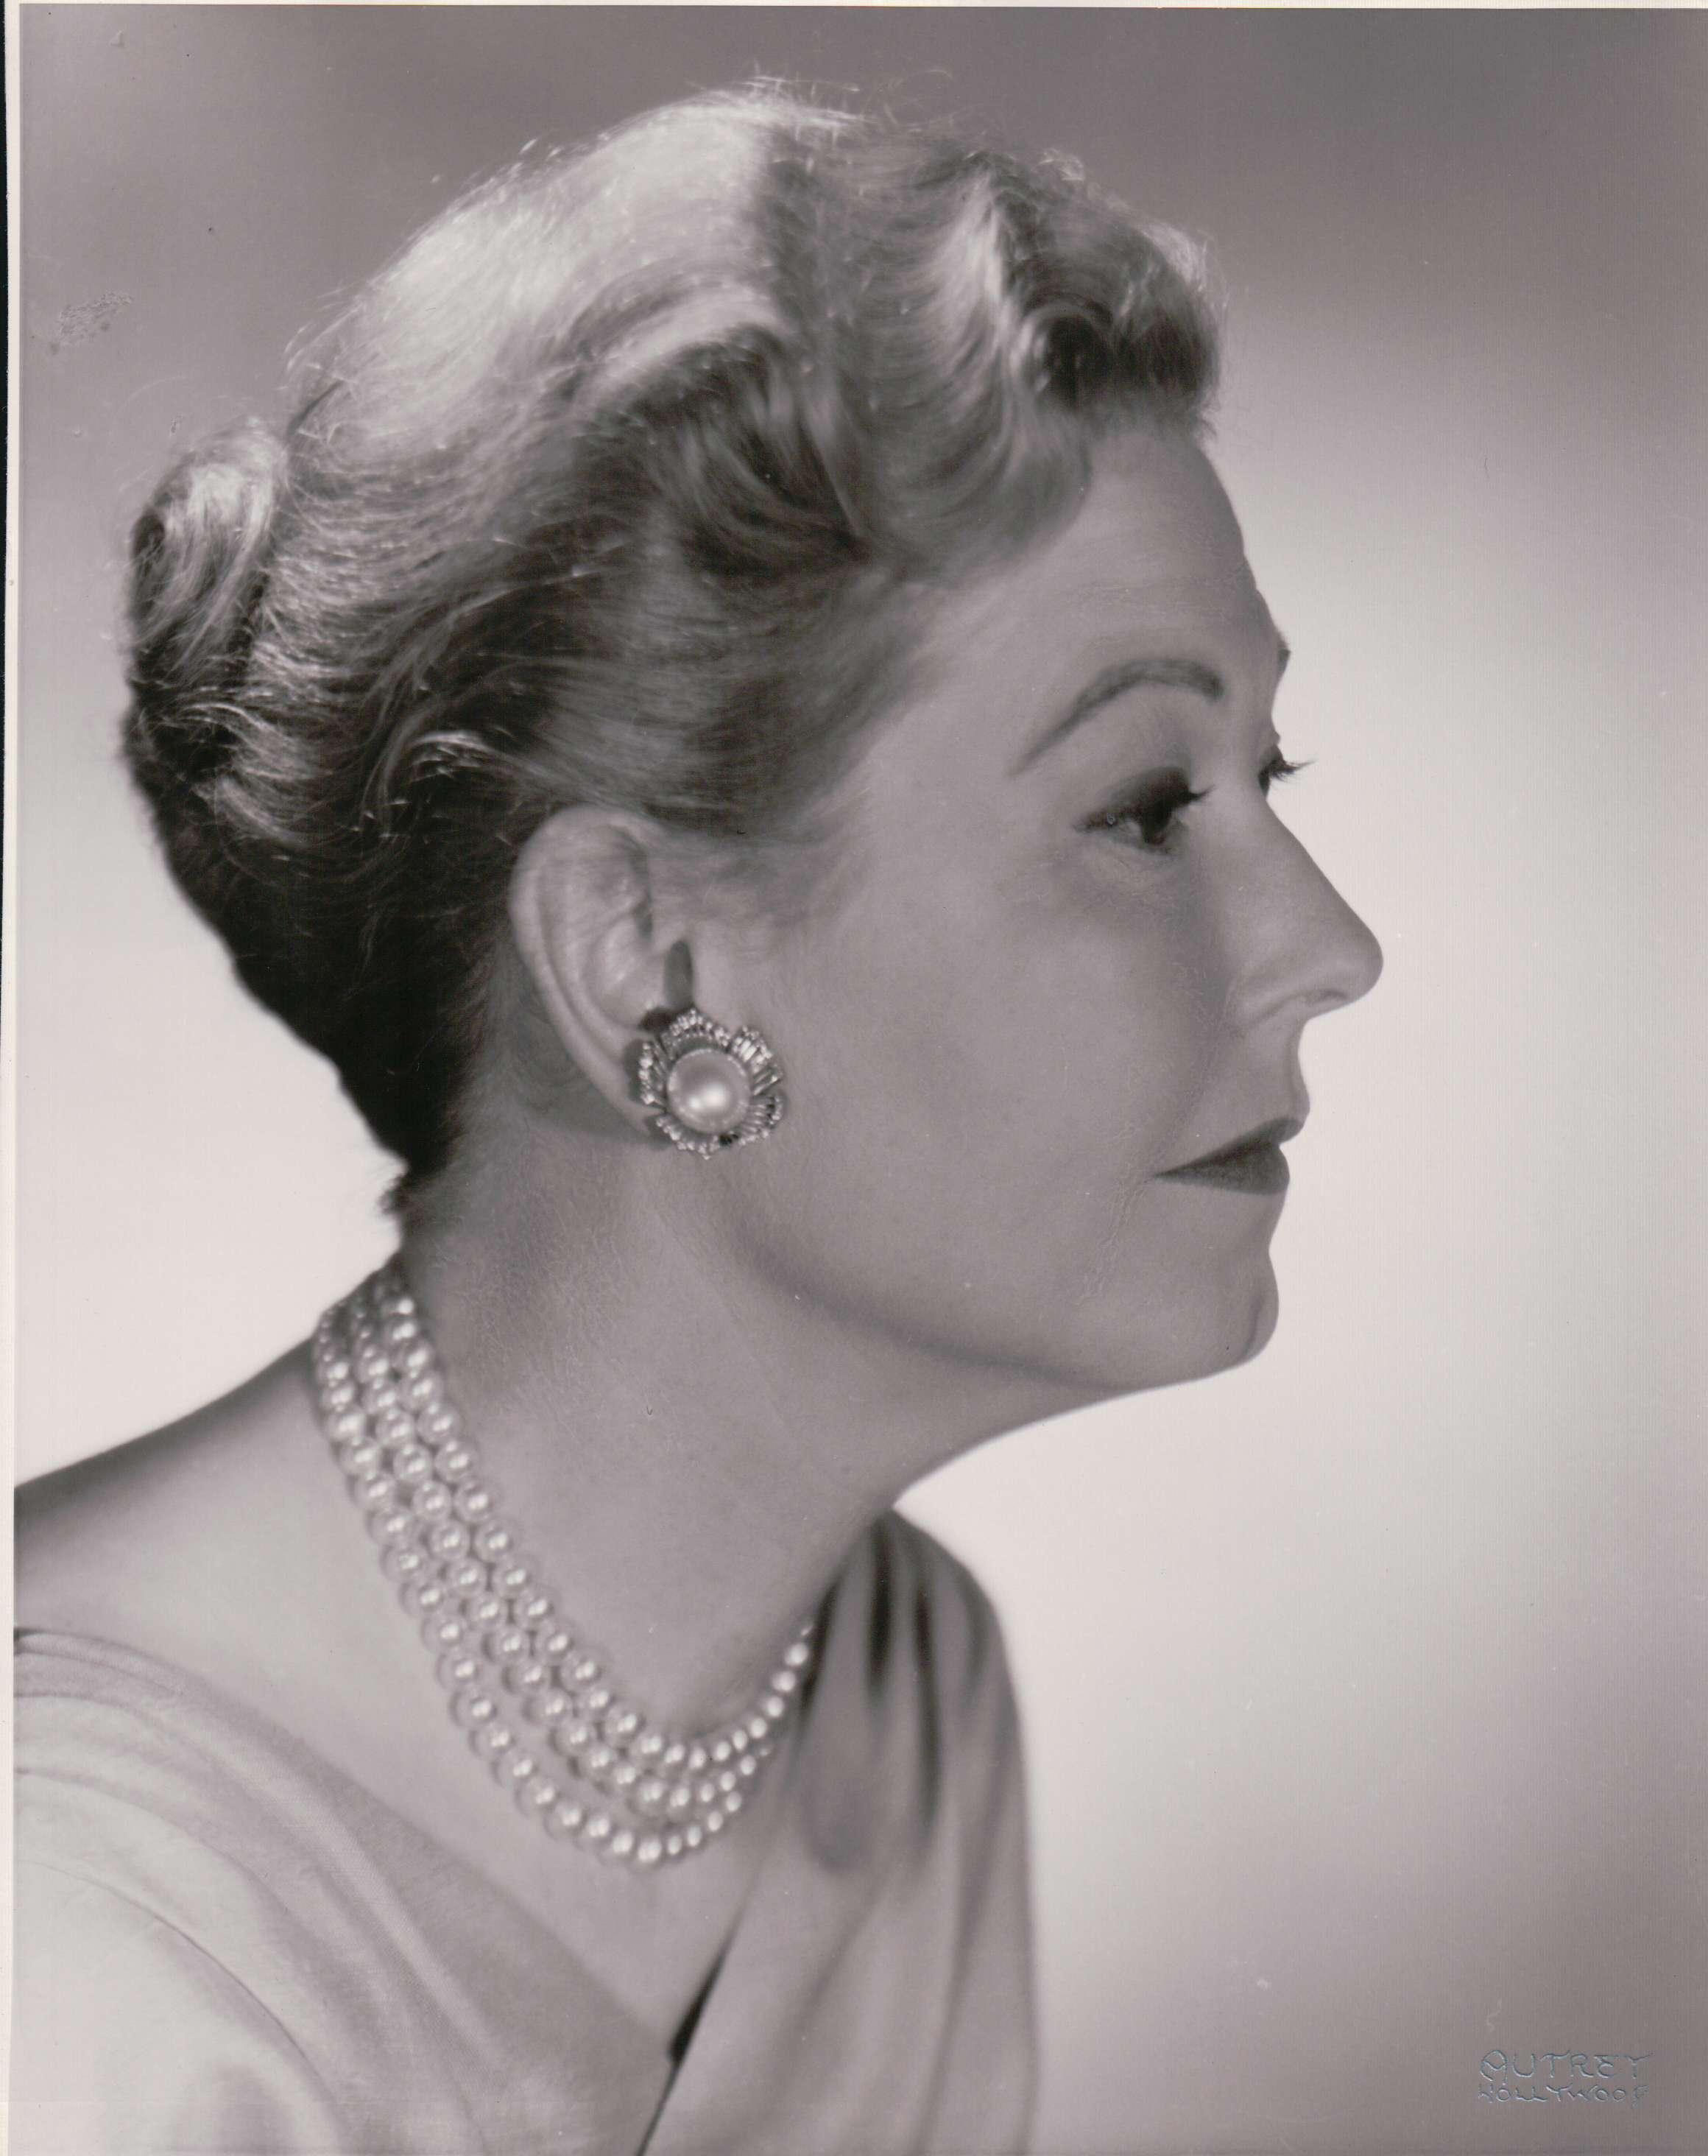 Josephine Hutchinson